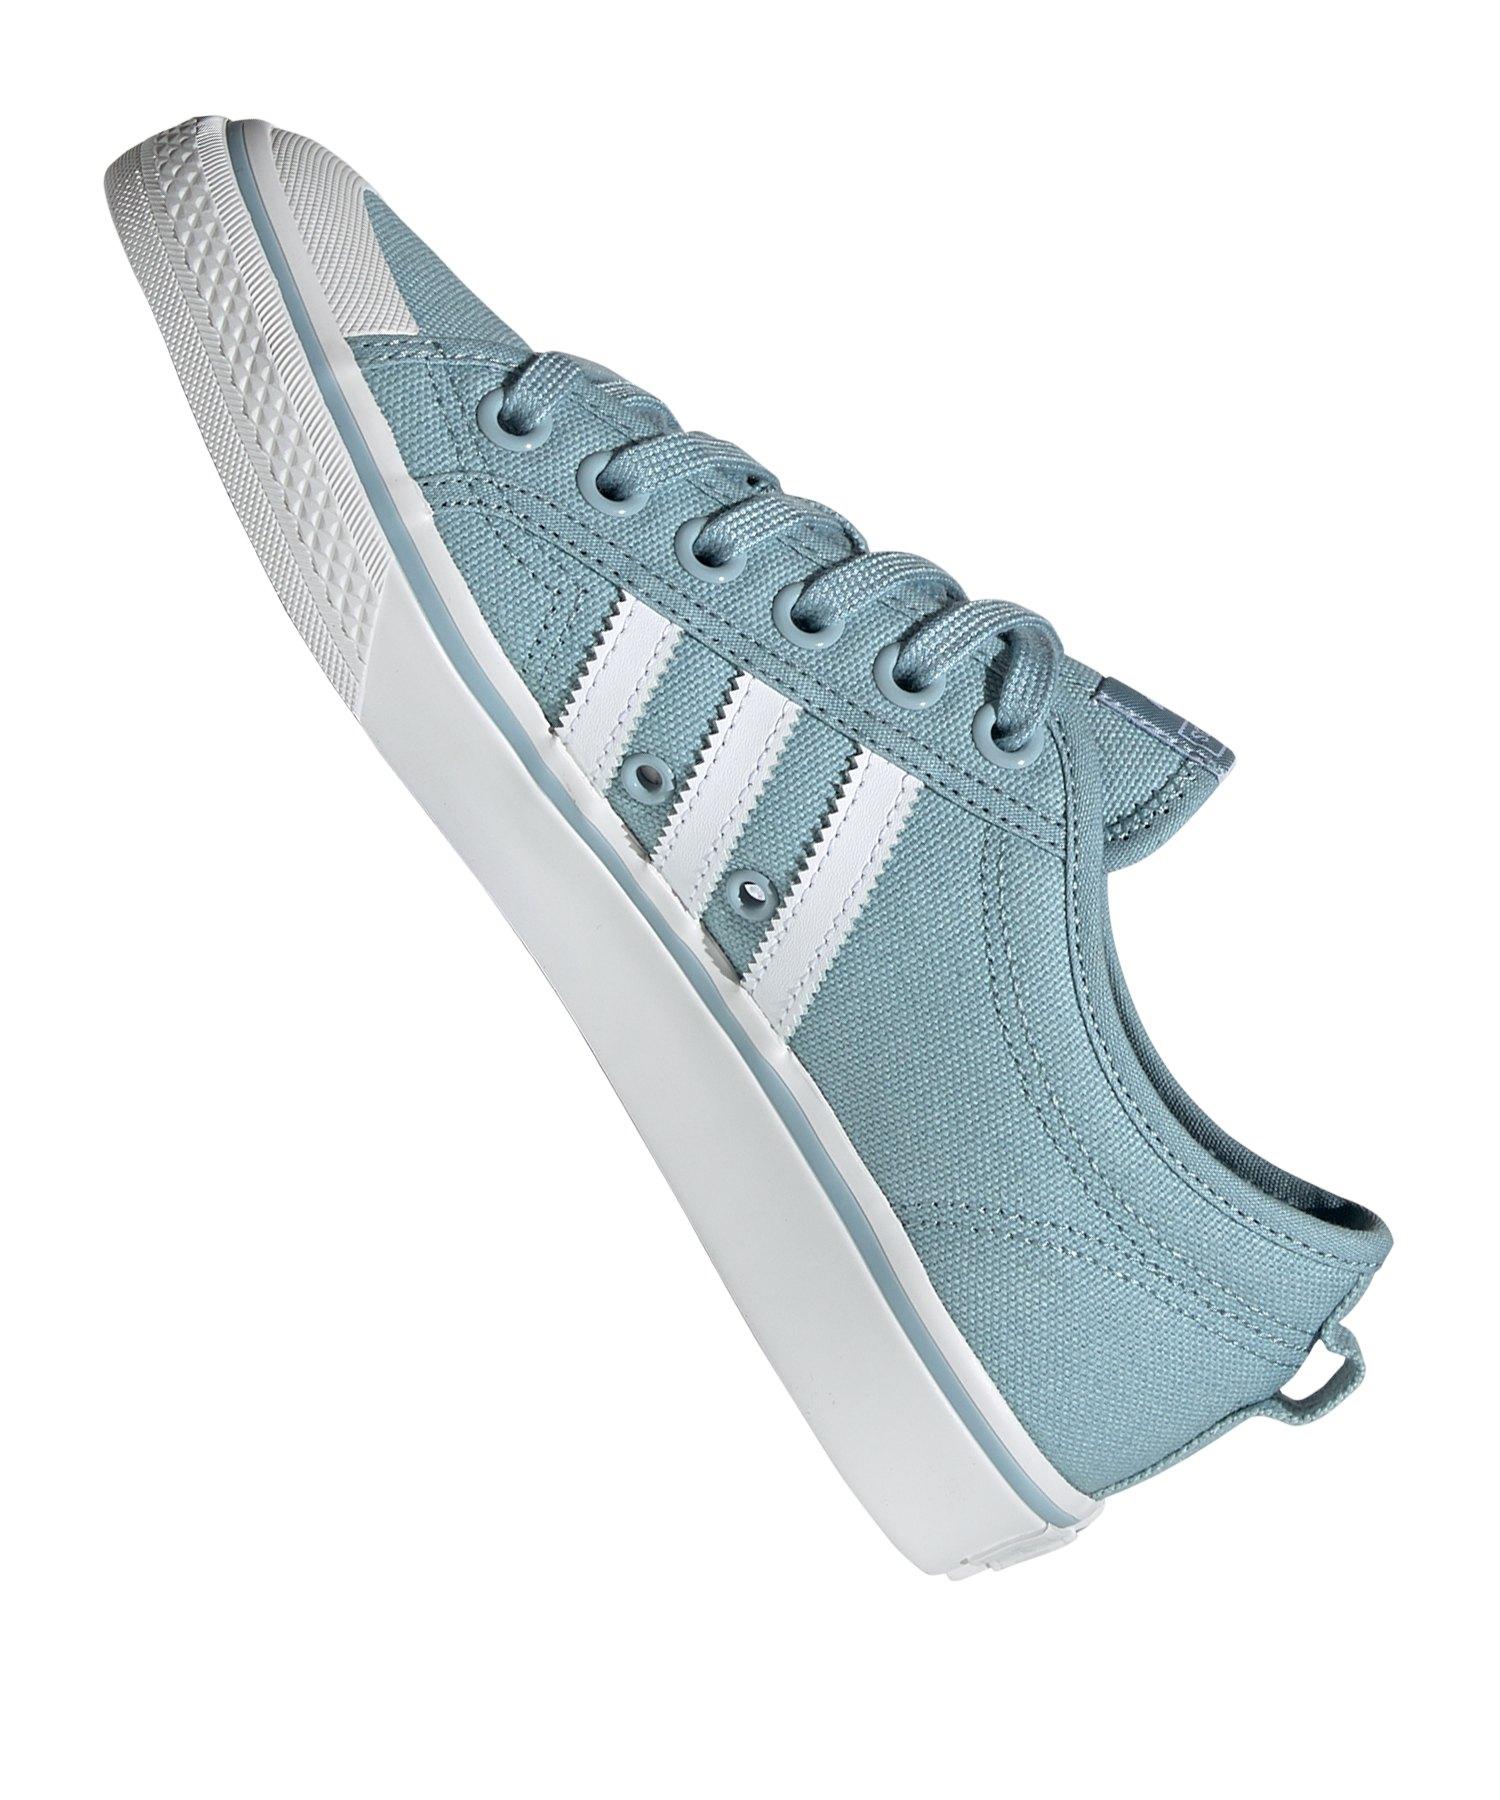 Originals Nizza Grau Damen Adidas Sneaker PuZiXOkT